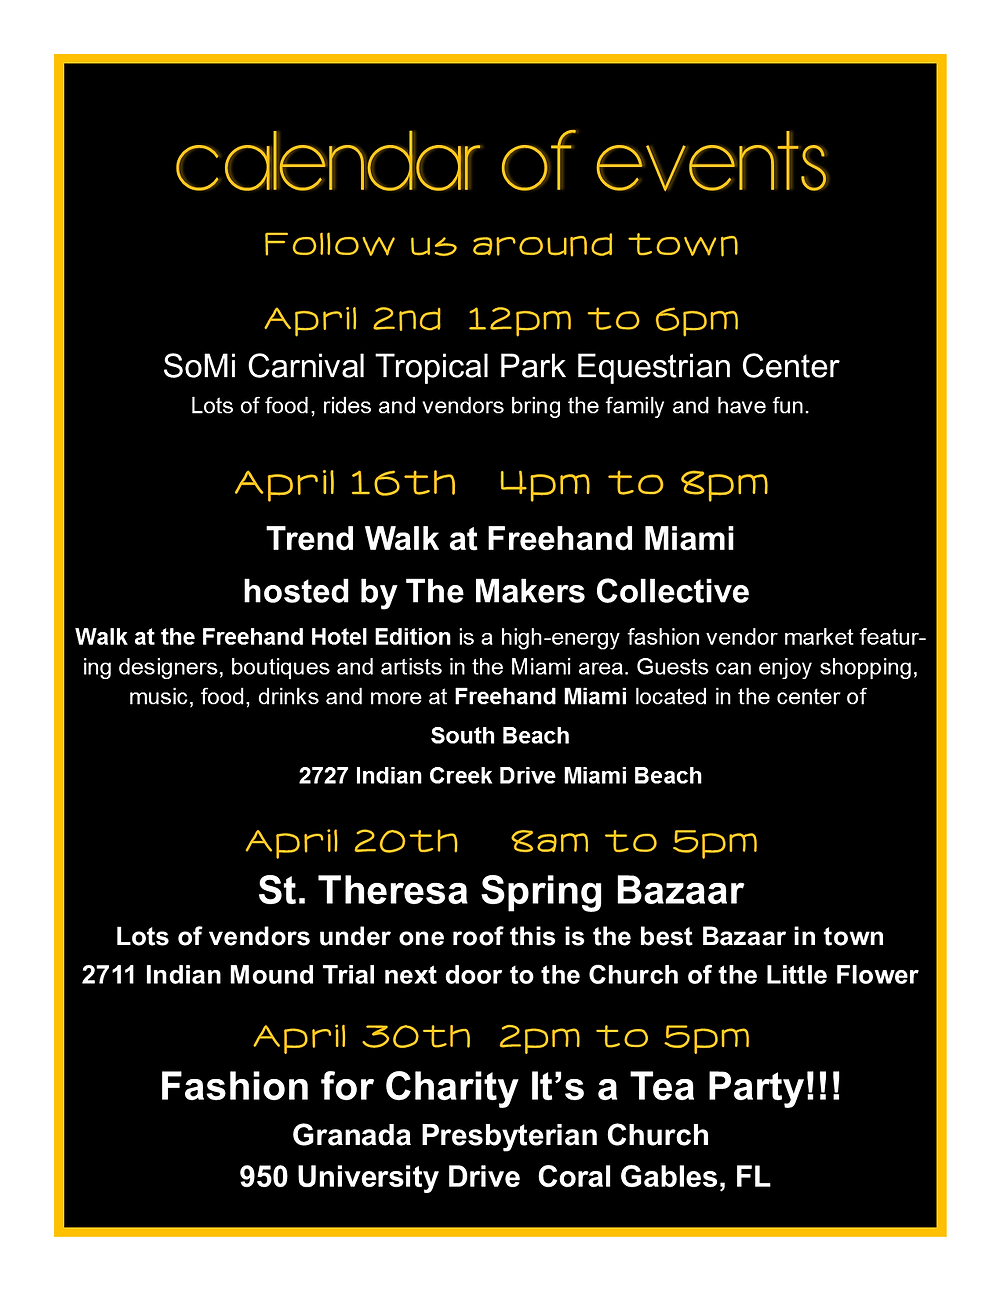 Calendar of Events for April 2016